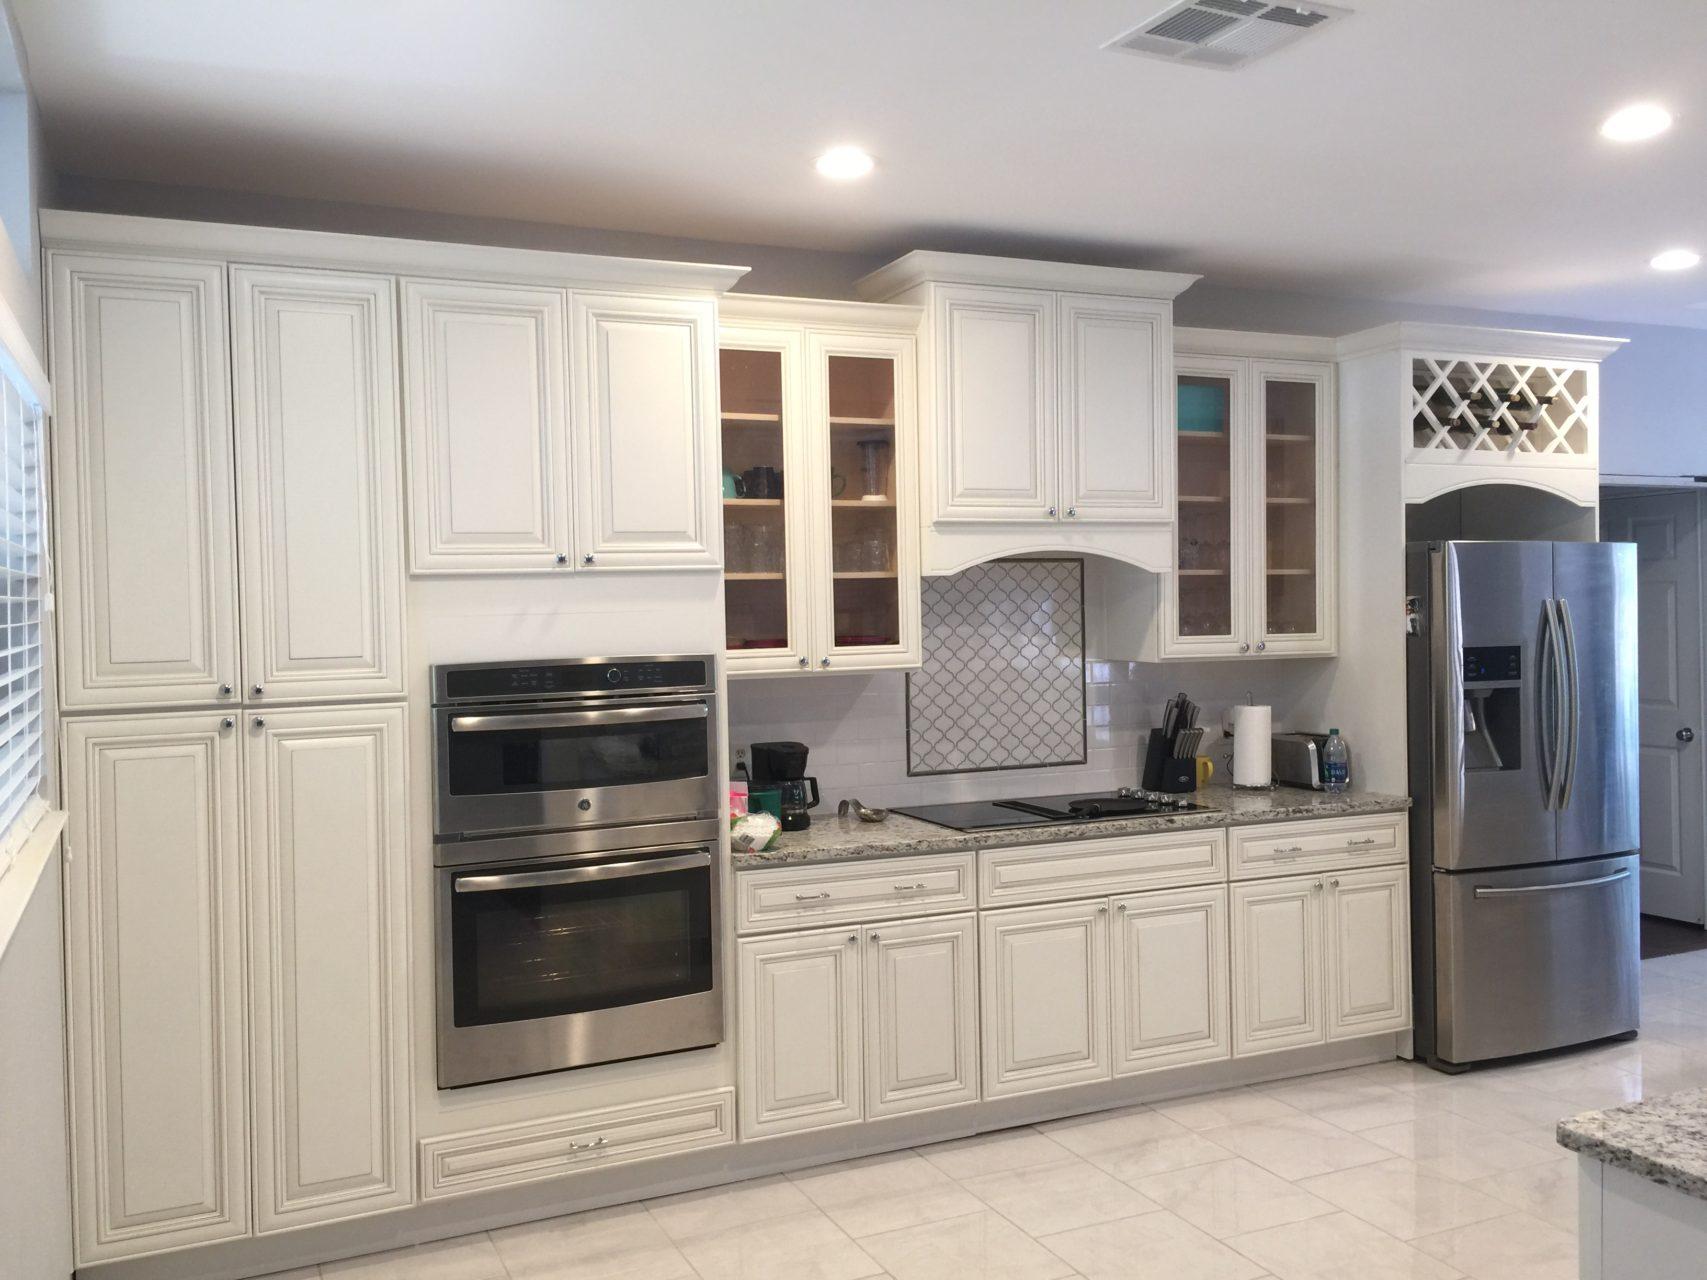 Alamo Ranch Kitchen Remodeling - New Generation Kitchen & Bath